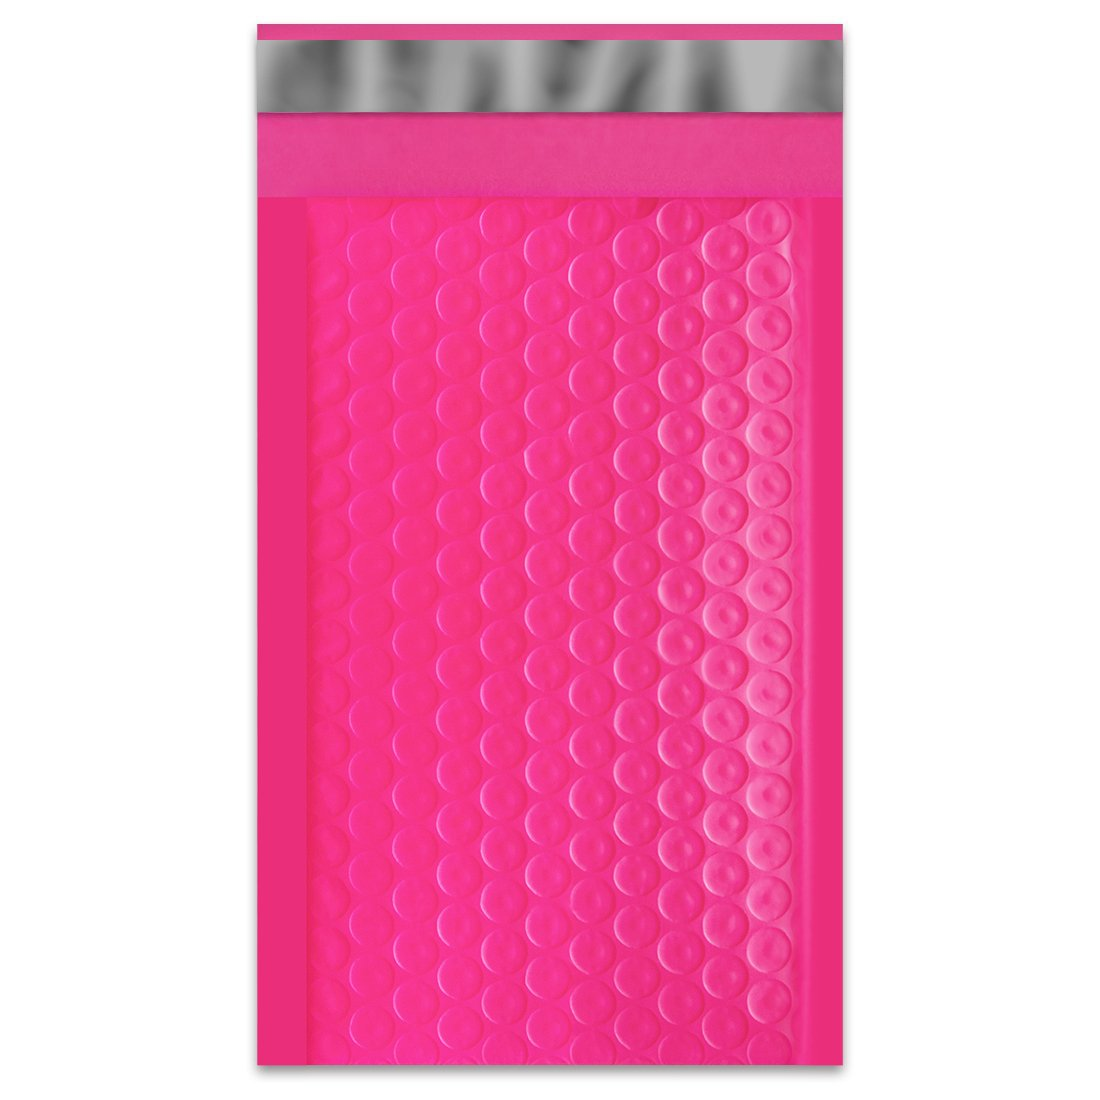 Sobres Burbujas Plastico Rosa X 50 (10x18cm) Shiplies